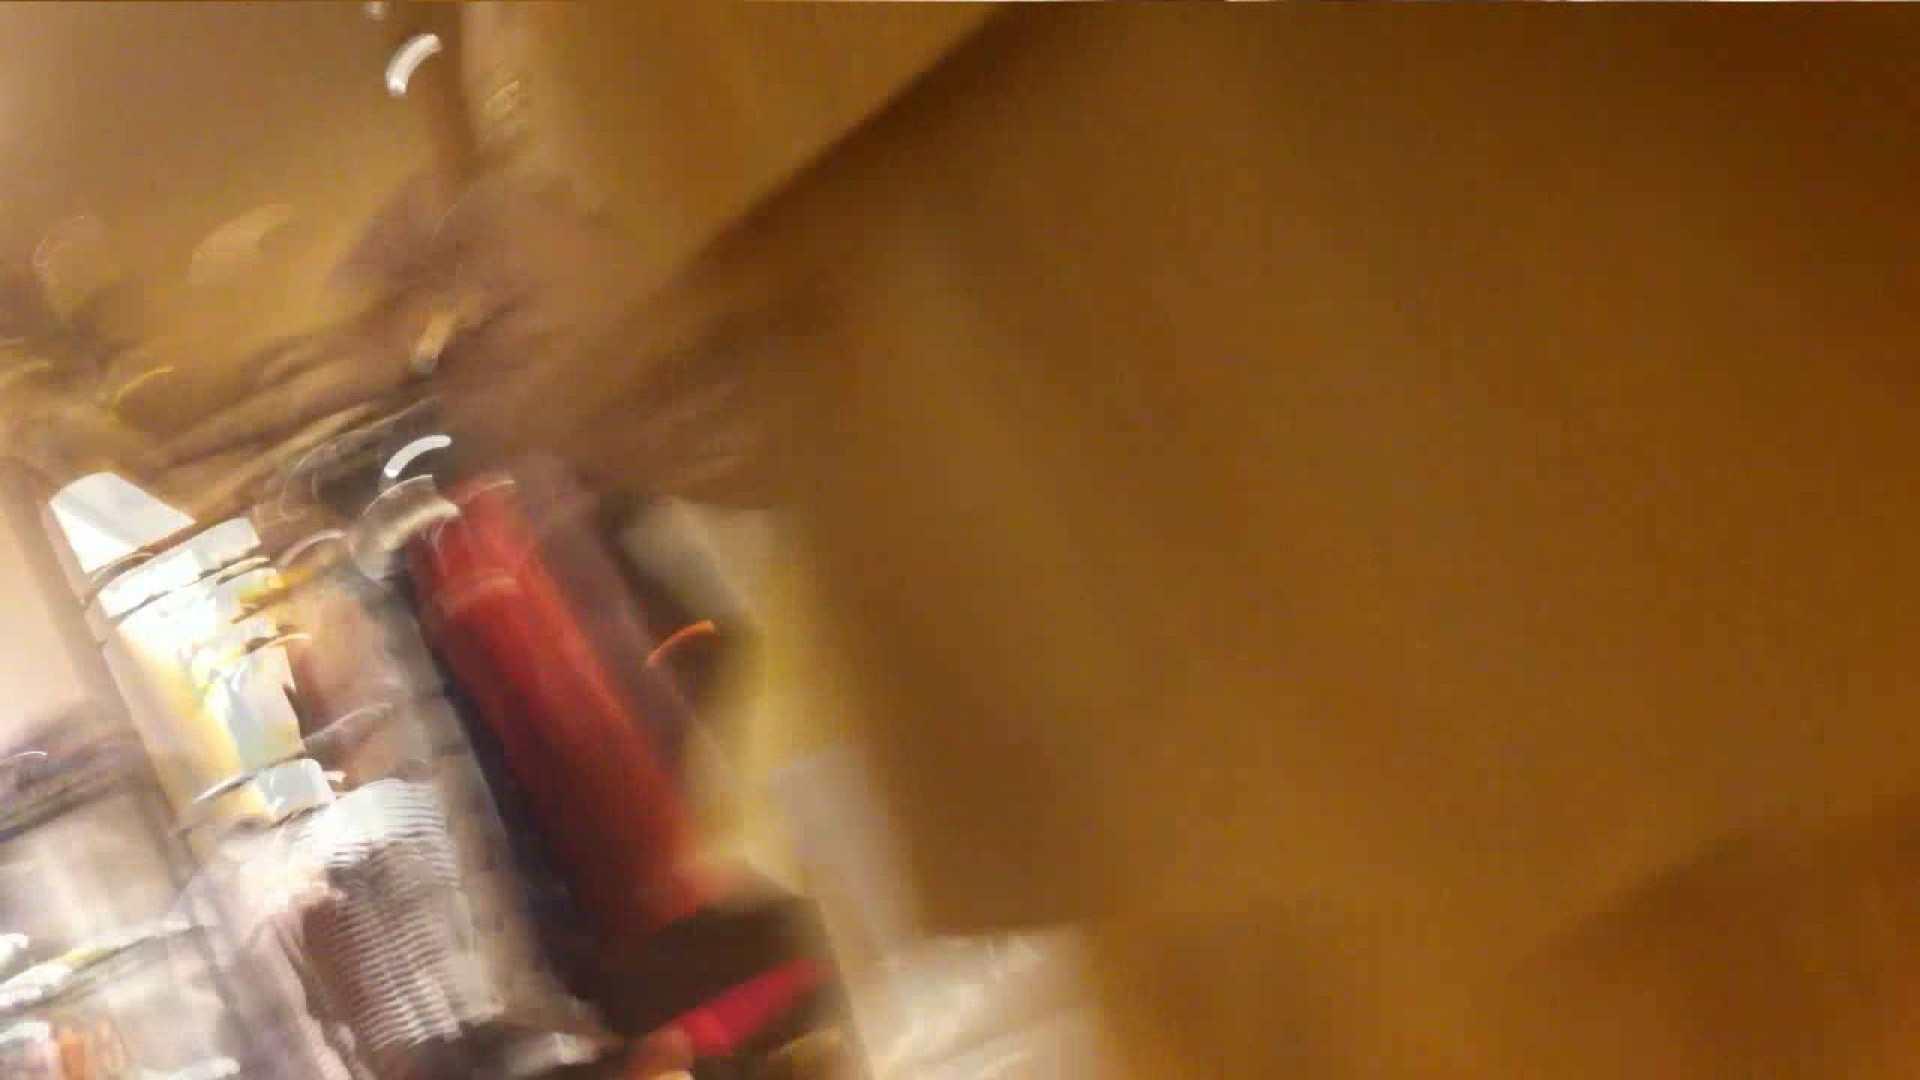 vol.34 美人アパレル胸チラ&パンチラ メガネ属性っていいよね♥ チラ歓迎 戯れ無修正画像 104pic 81